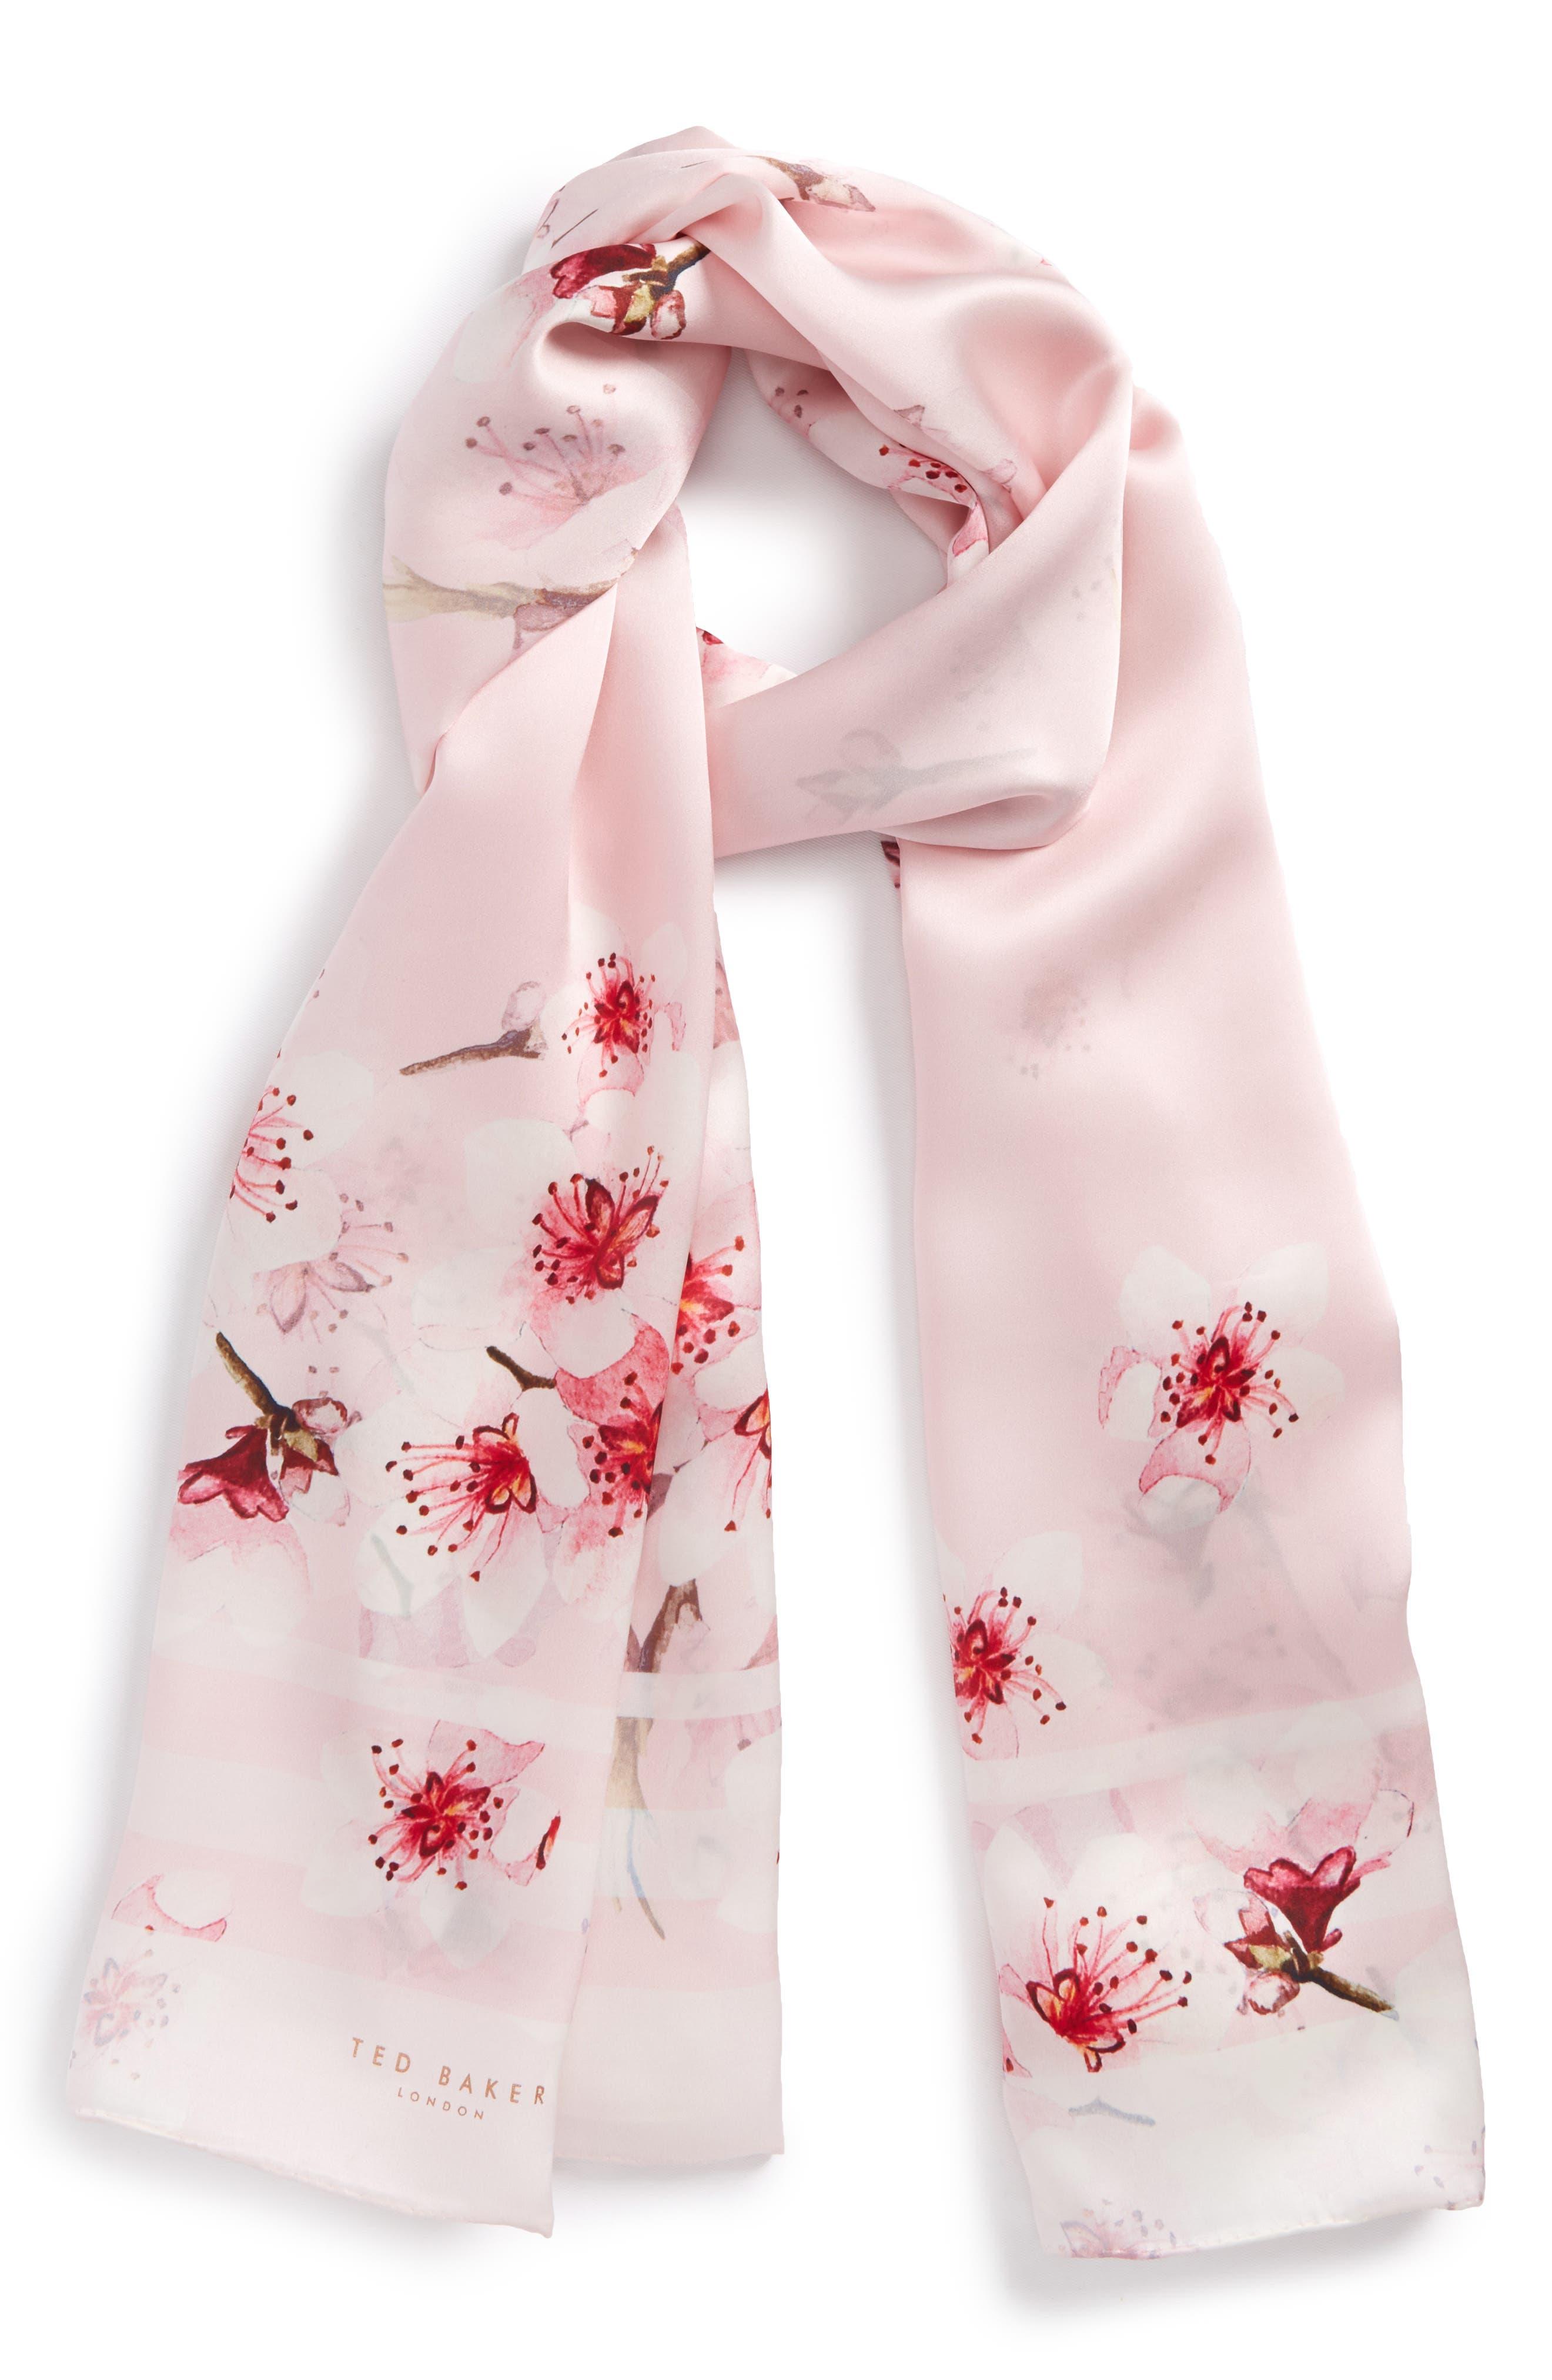 Ted Baker London Soft Blossom Silk Scarf